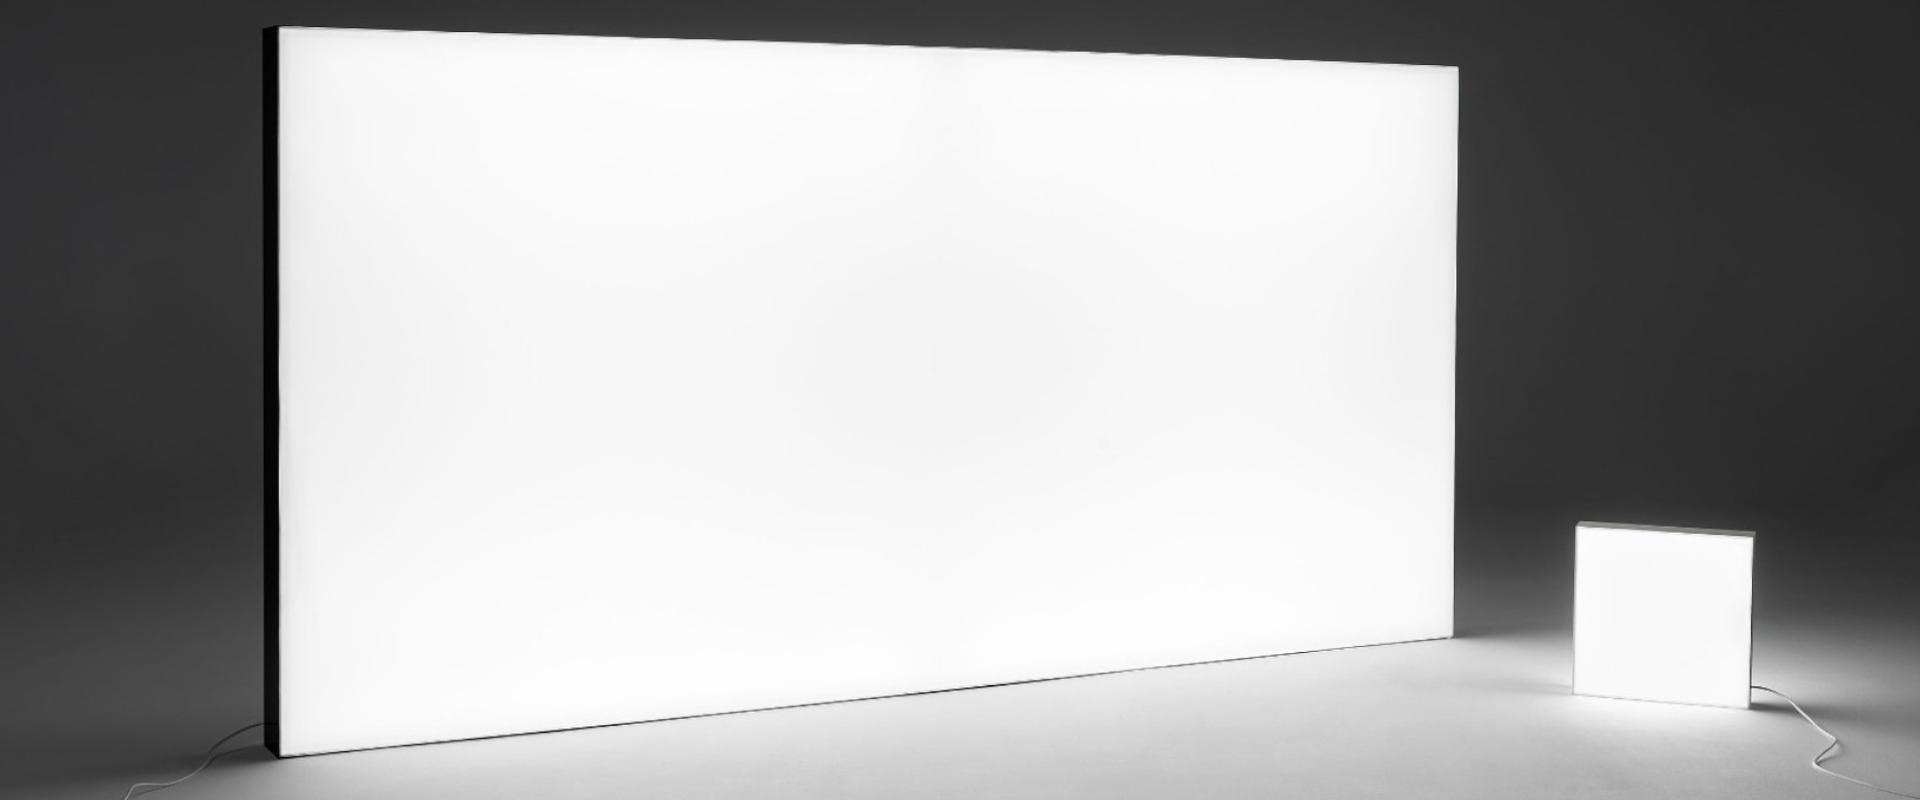 Backlit fabric system